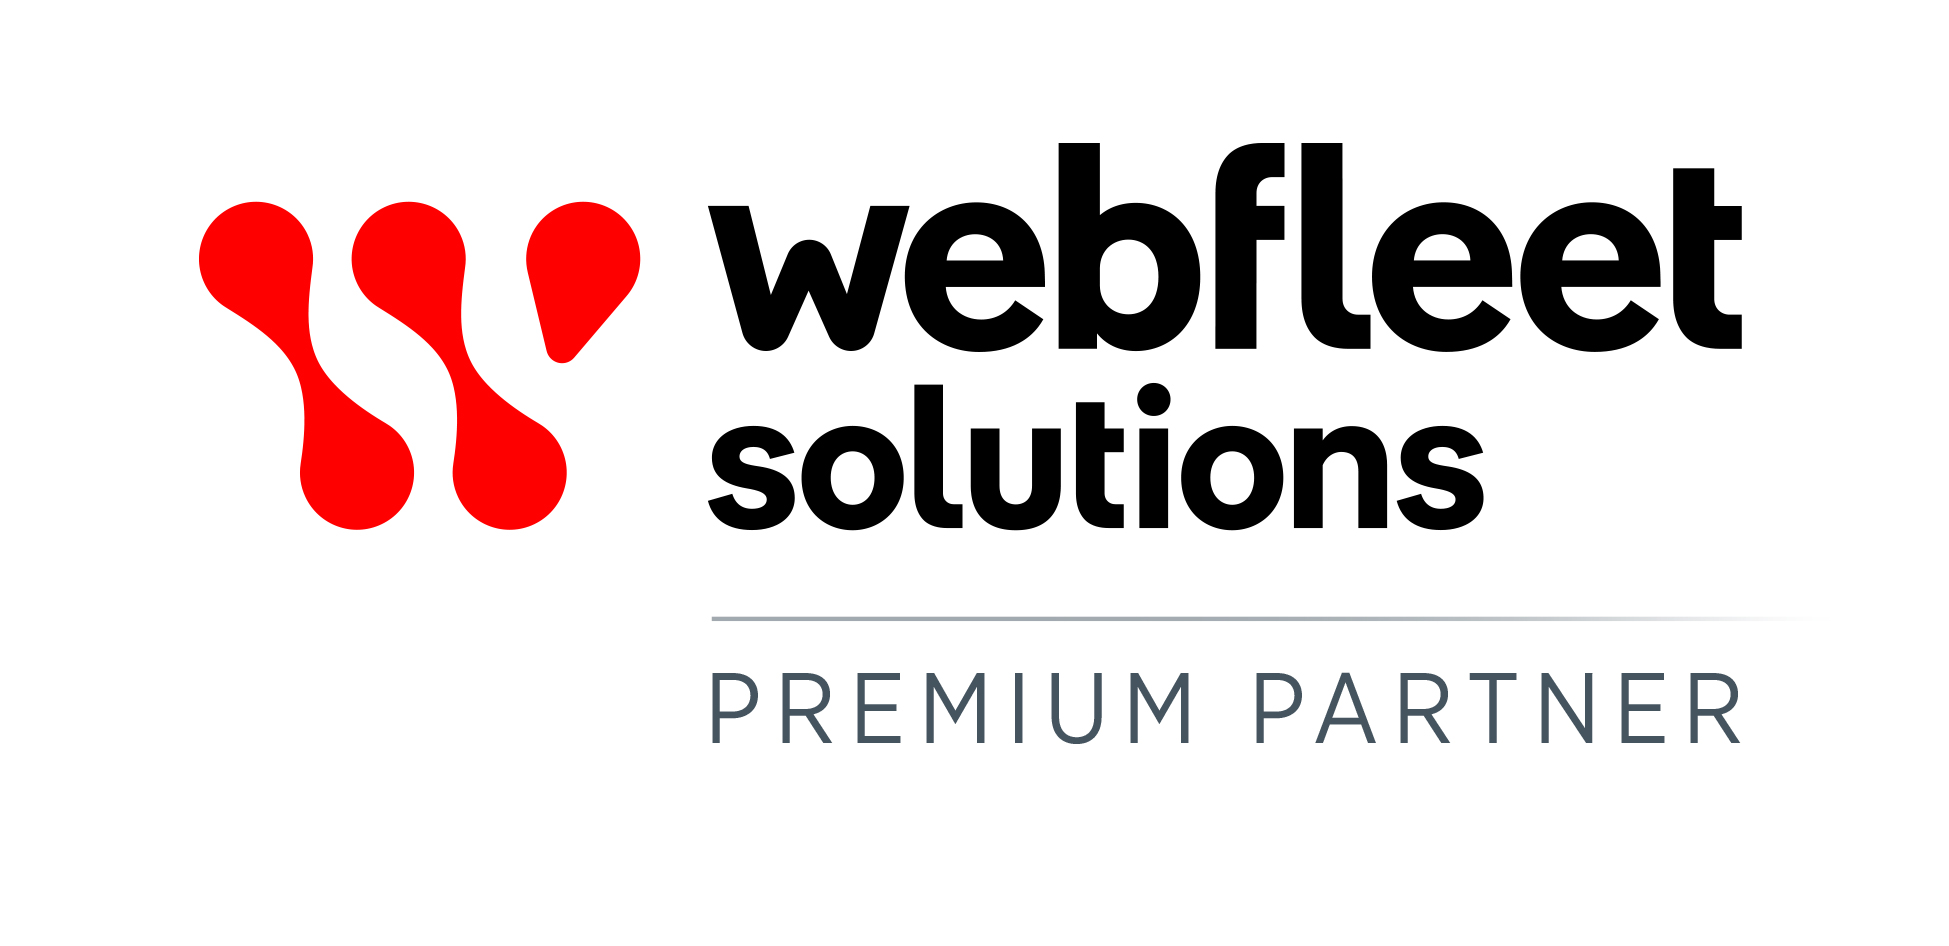 https://navcomm-gmbh.de/wp-content/uploads/2019/10/WFS_PREMIUM_partner_logo.jpg